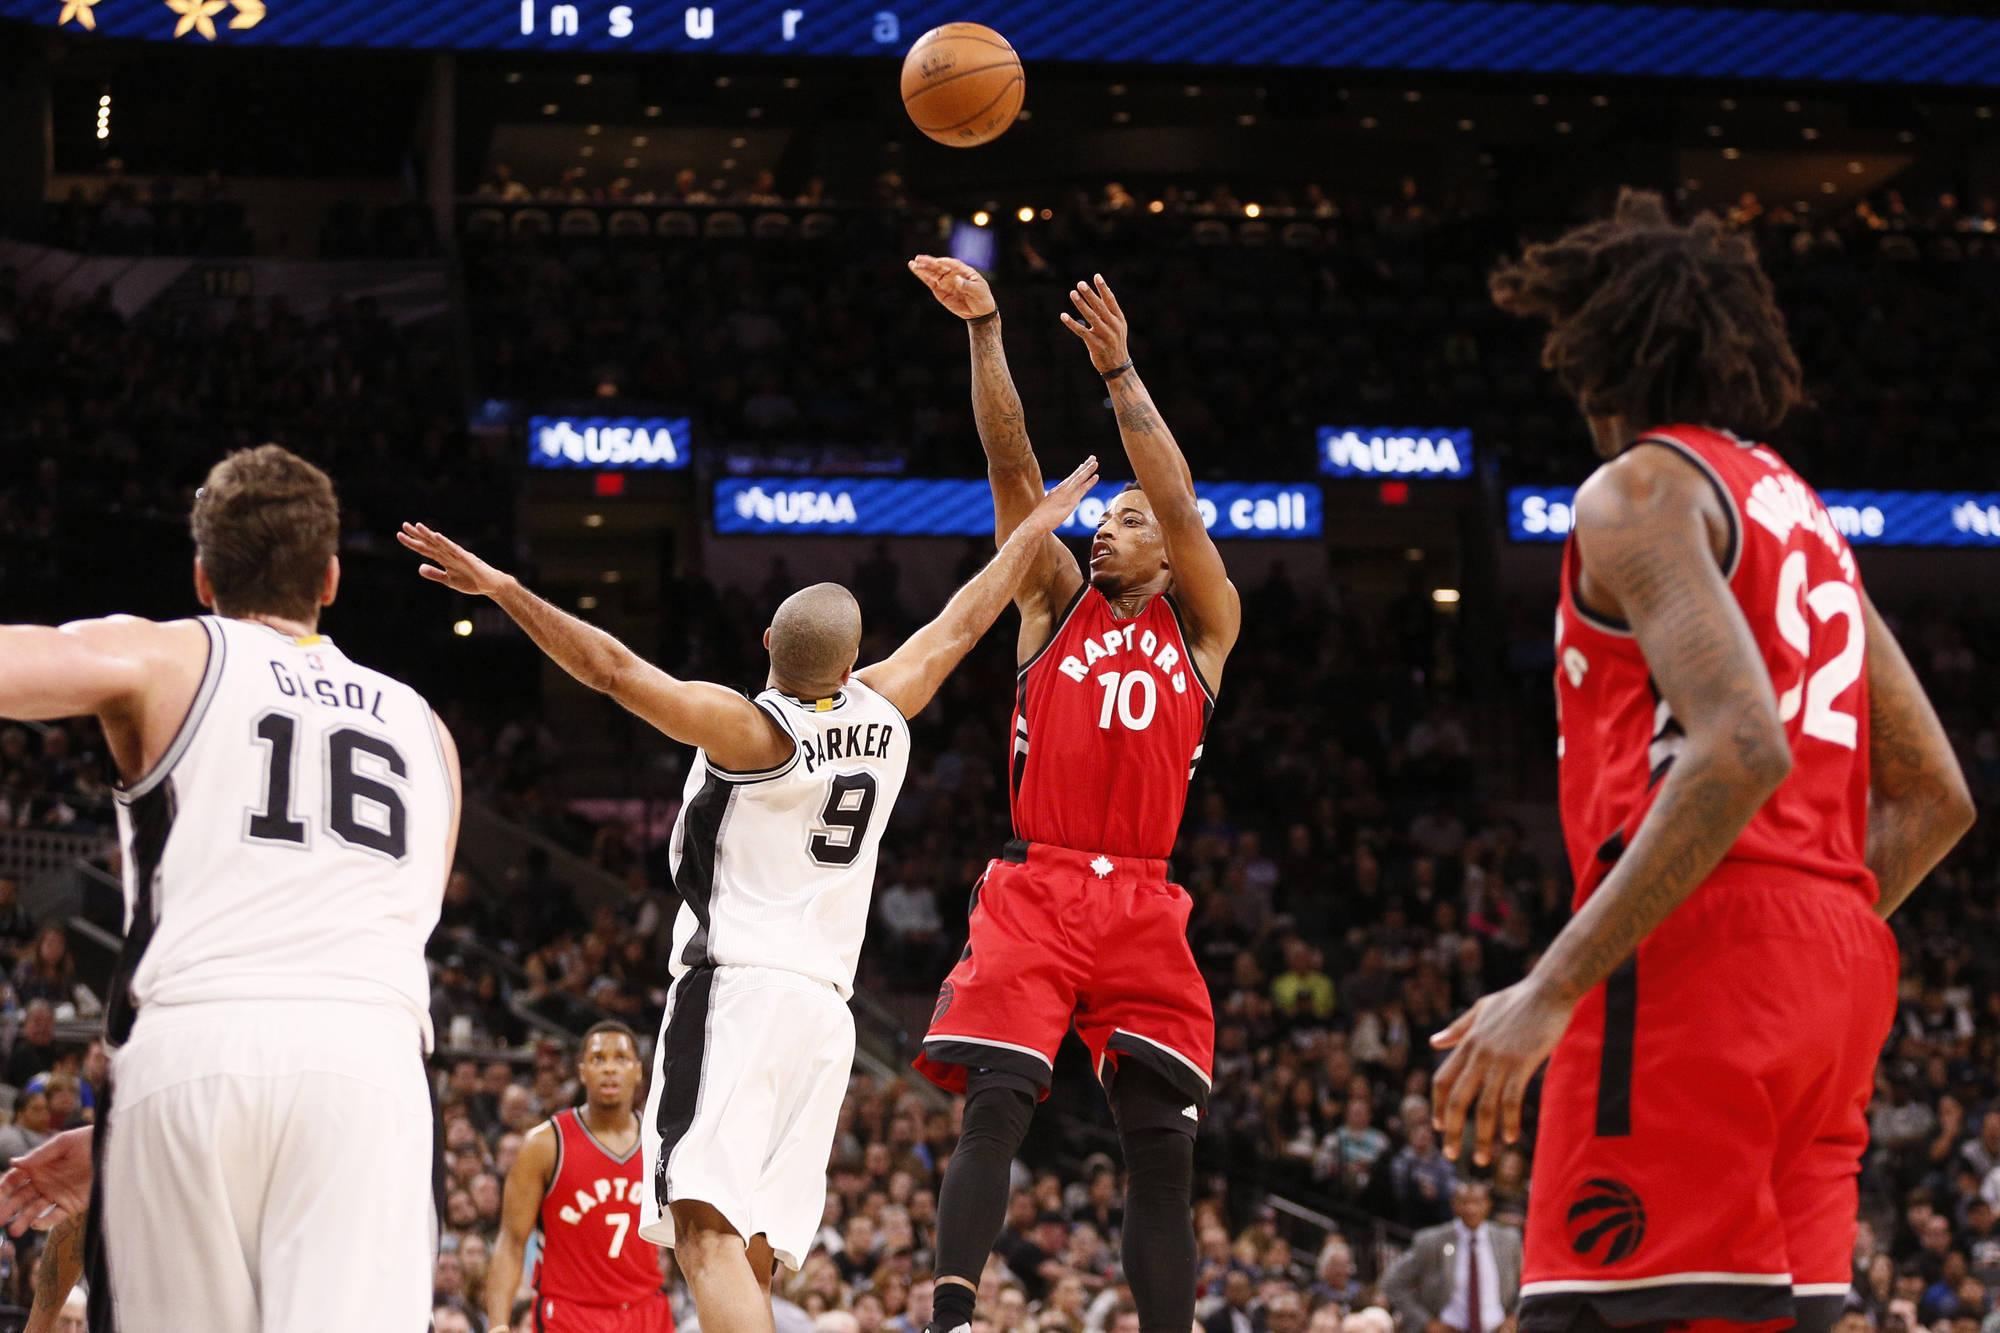 Toronto Raptors lose to the San Antonio Spurs in final game of road trip